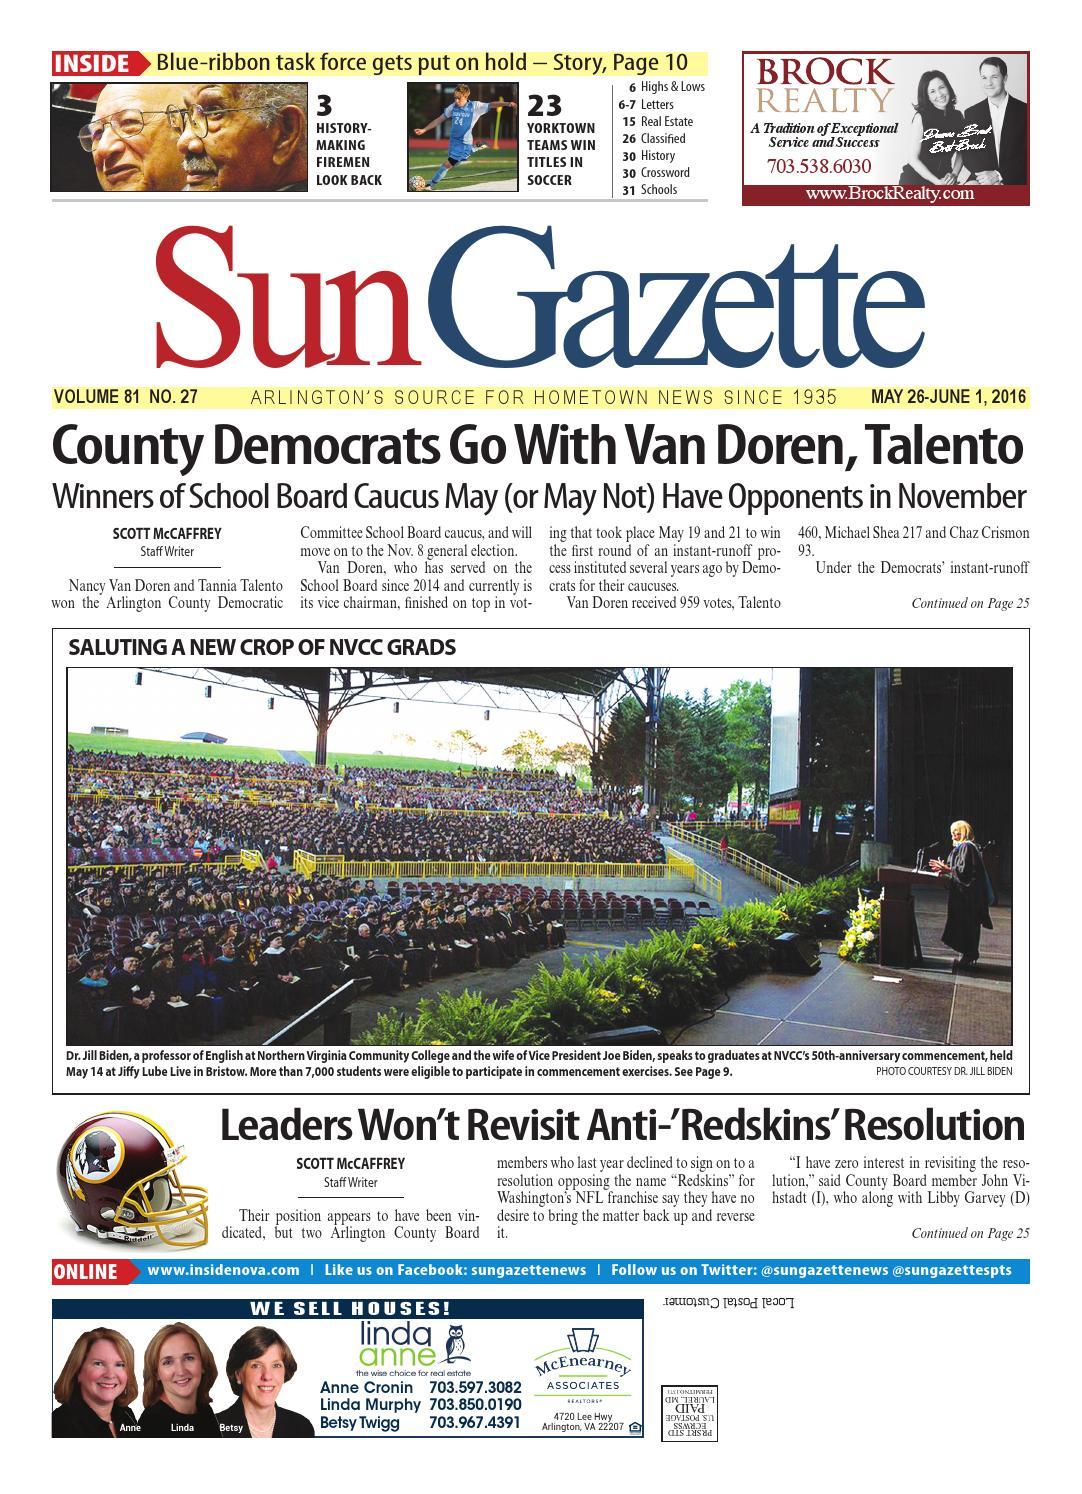 Sun gazette arlington may 26 2016 by insidenova issuu fandeluxe Choice Image